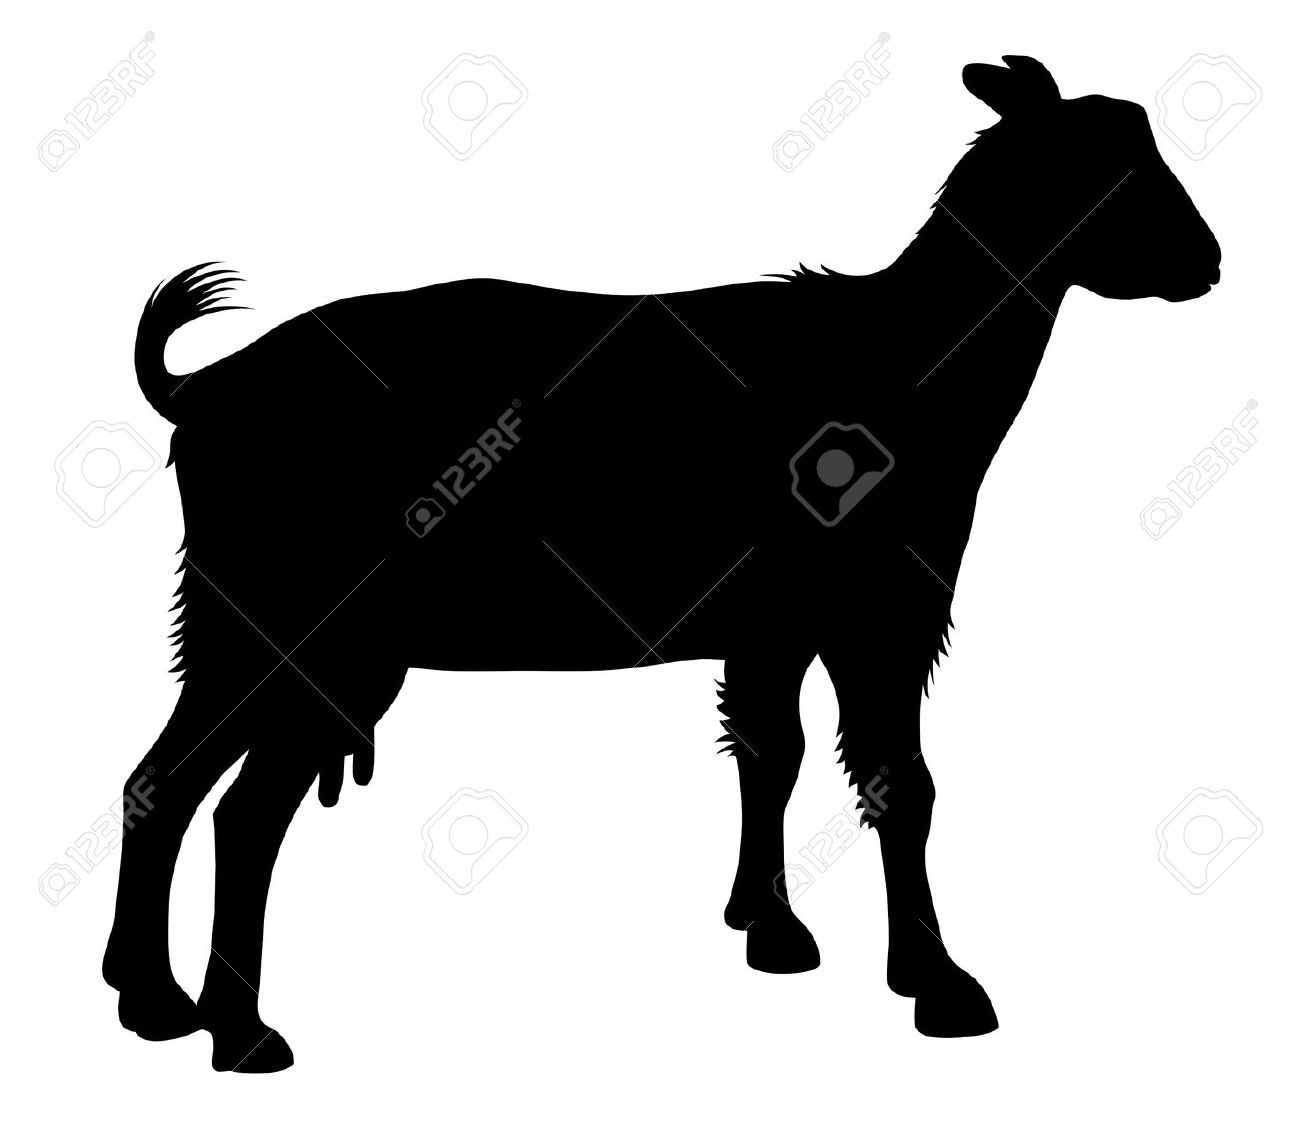 1300x1121 Detailed Vector Illustration Of Goat Silhouette Stock Vector